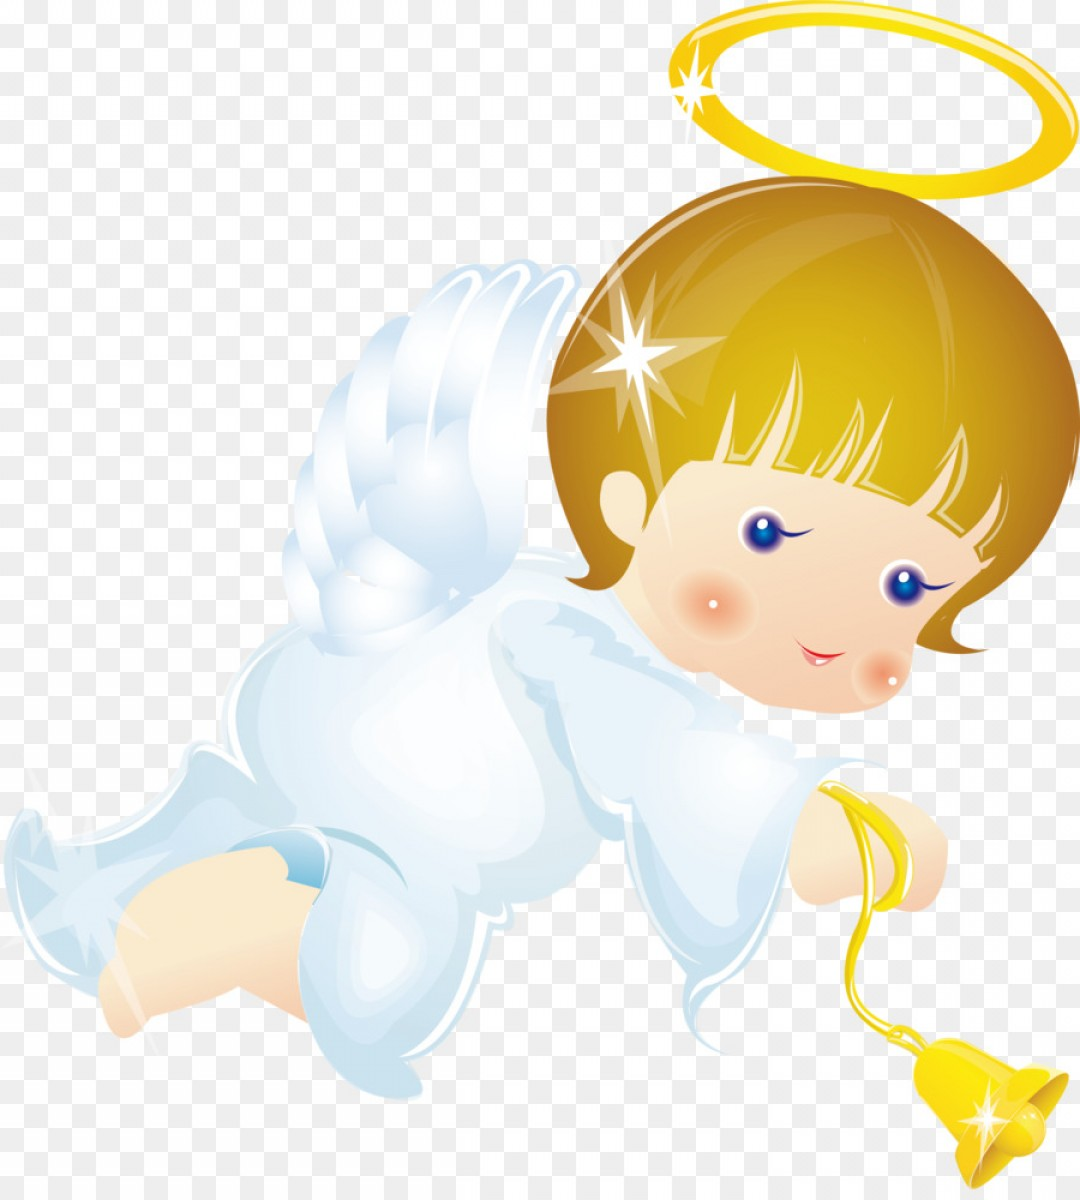 1080x1200 Png Angel Clip Art Beautiful Little Angel Vector Lazttweet